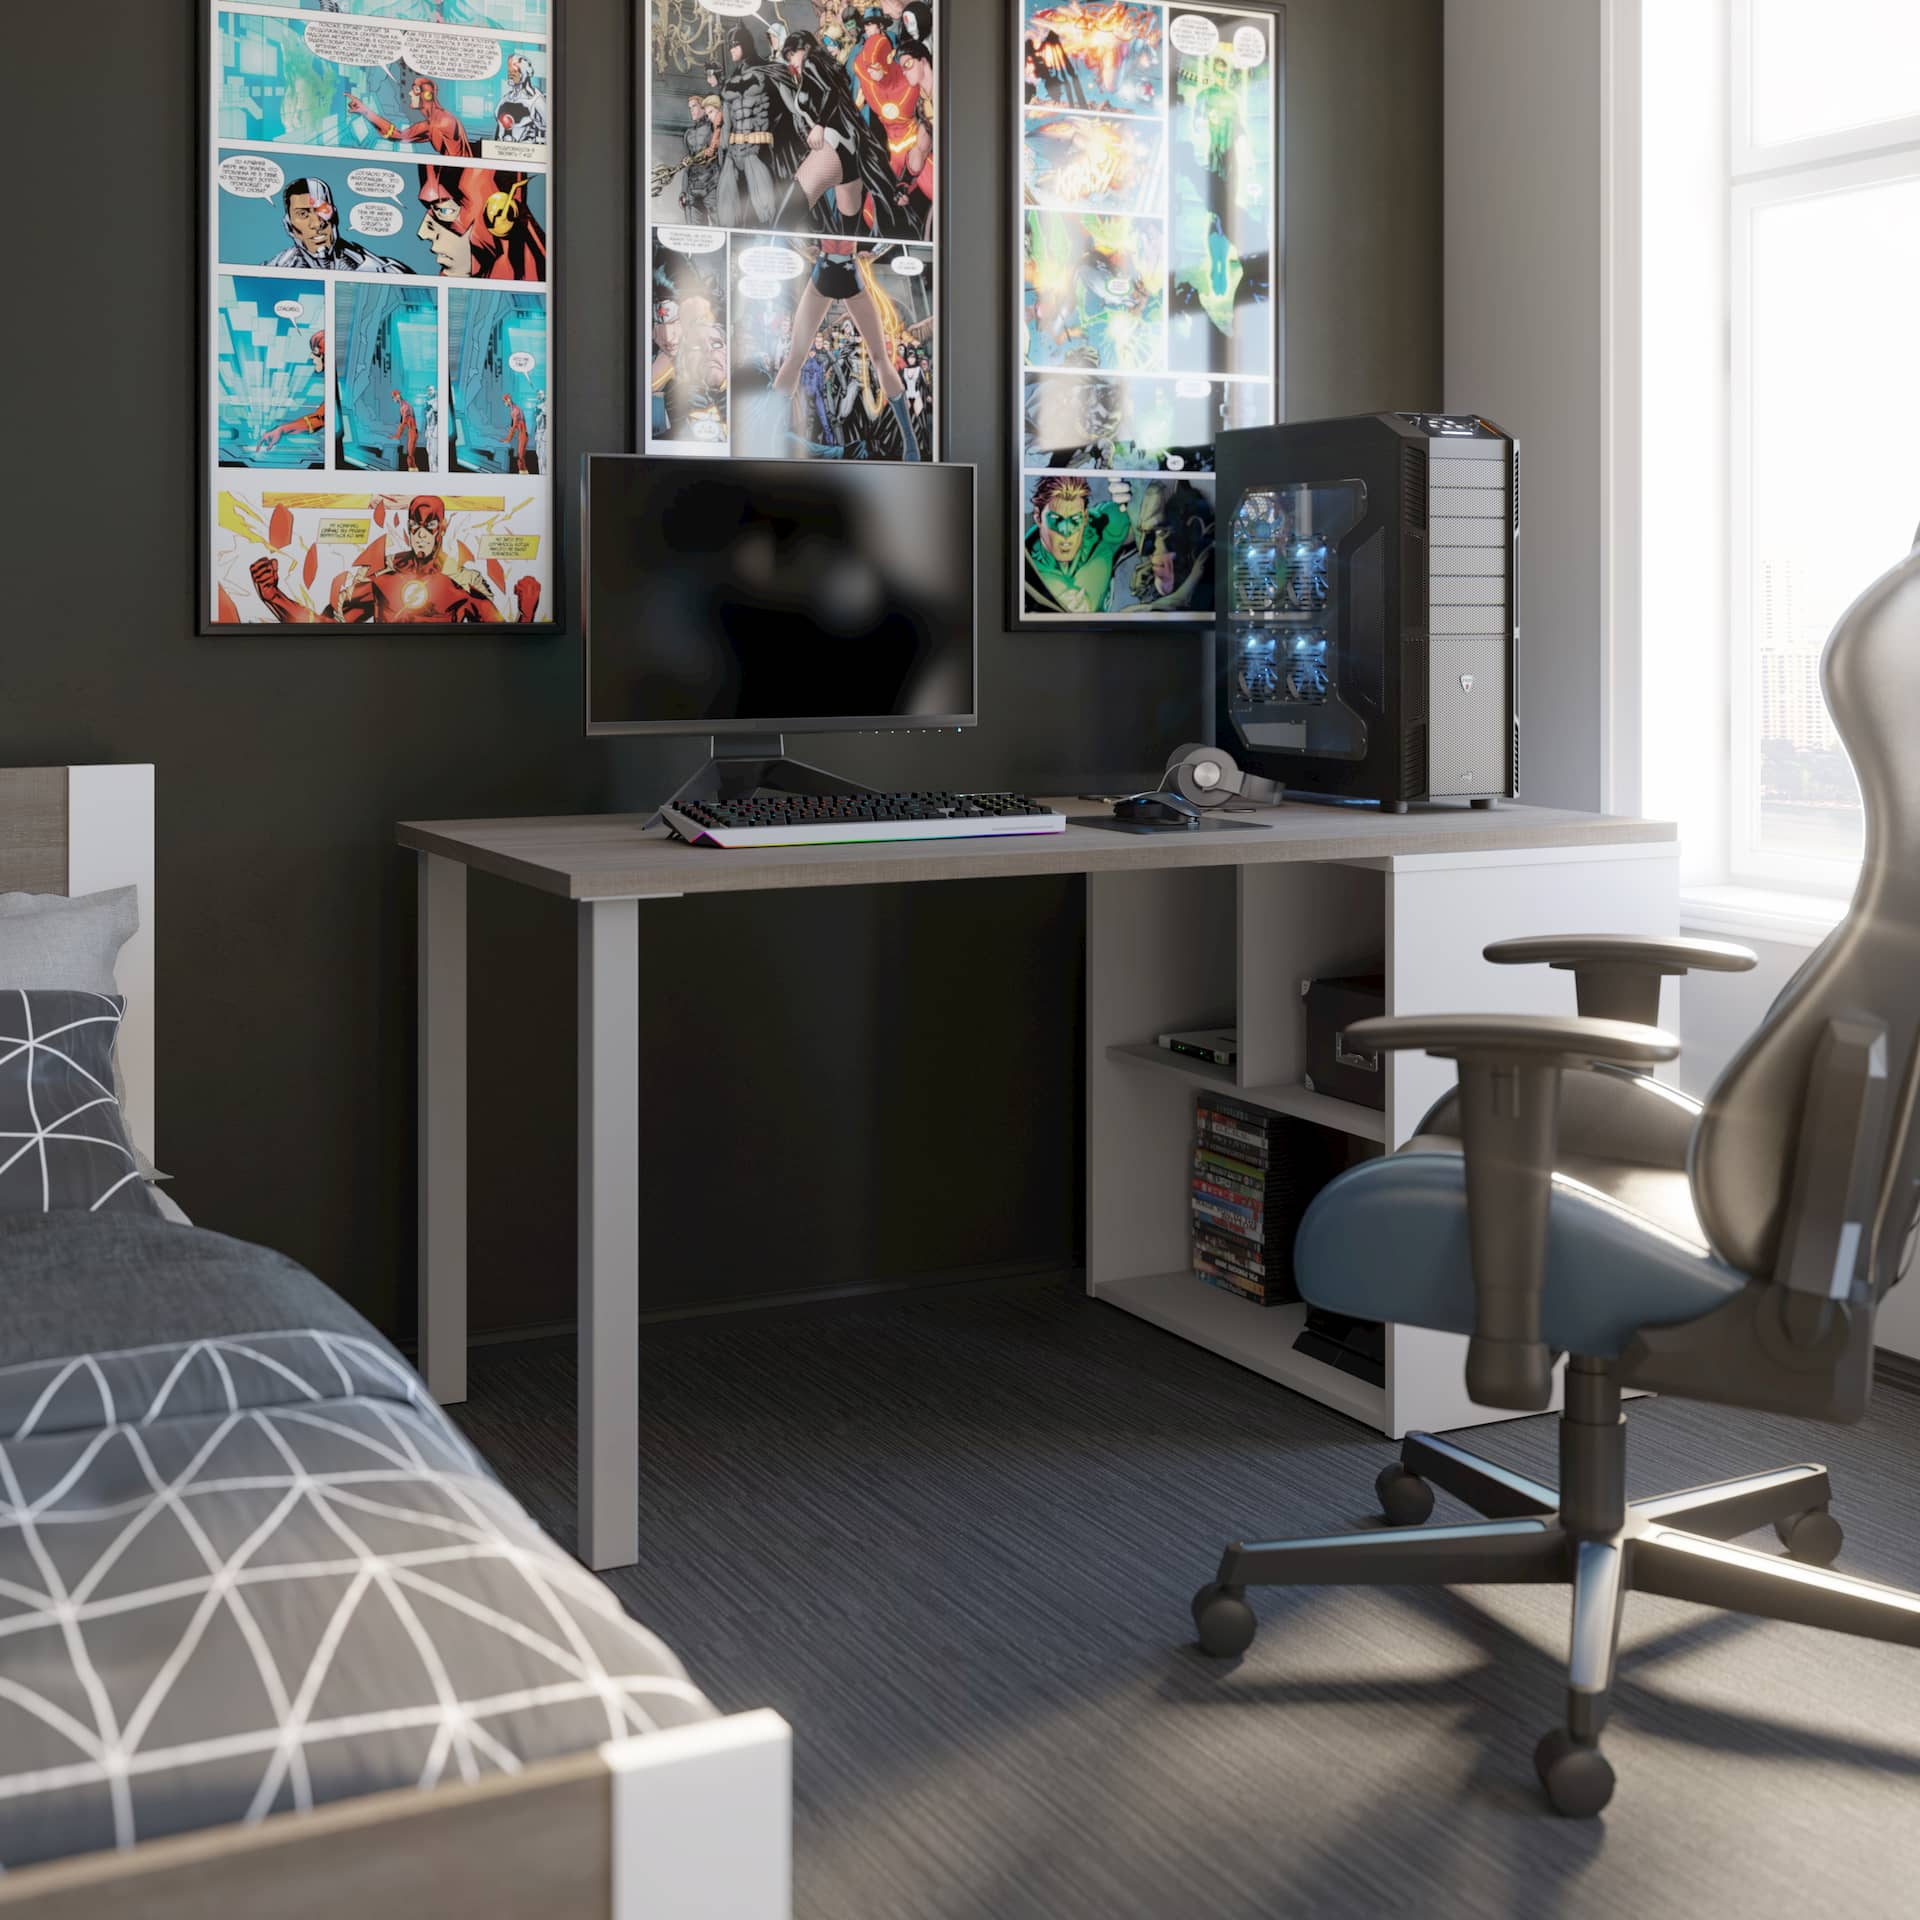 Gaming room inspiration